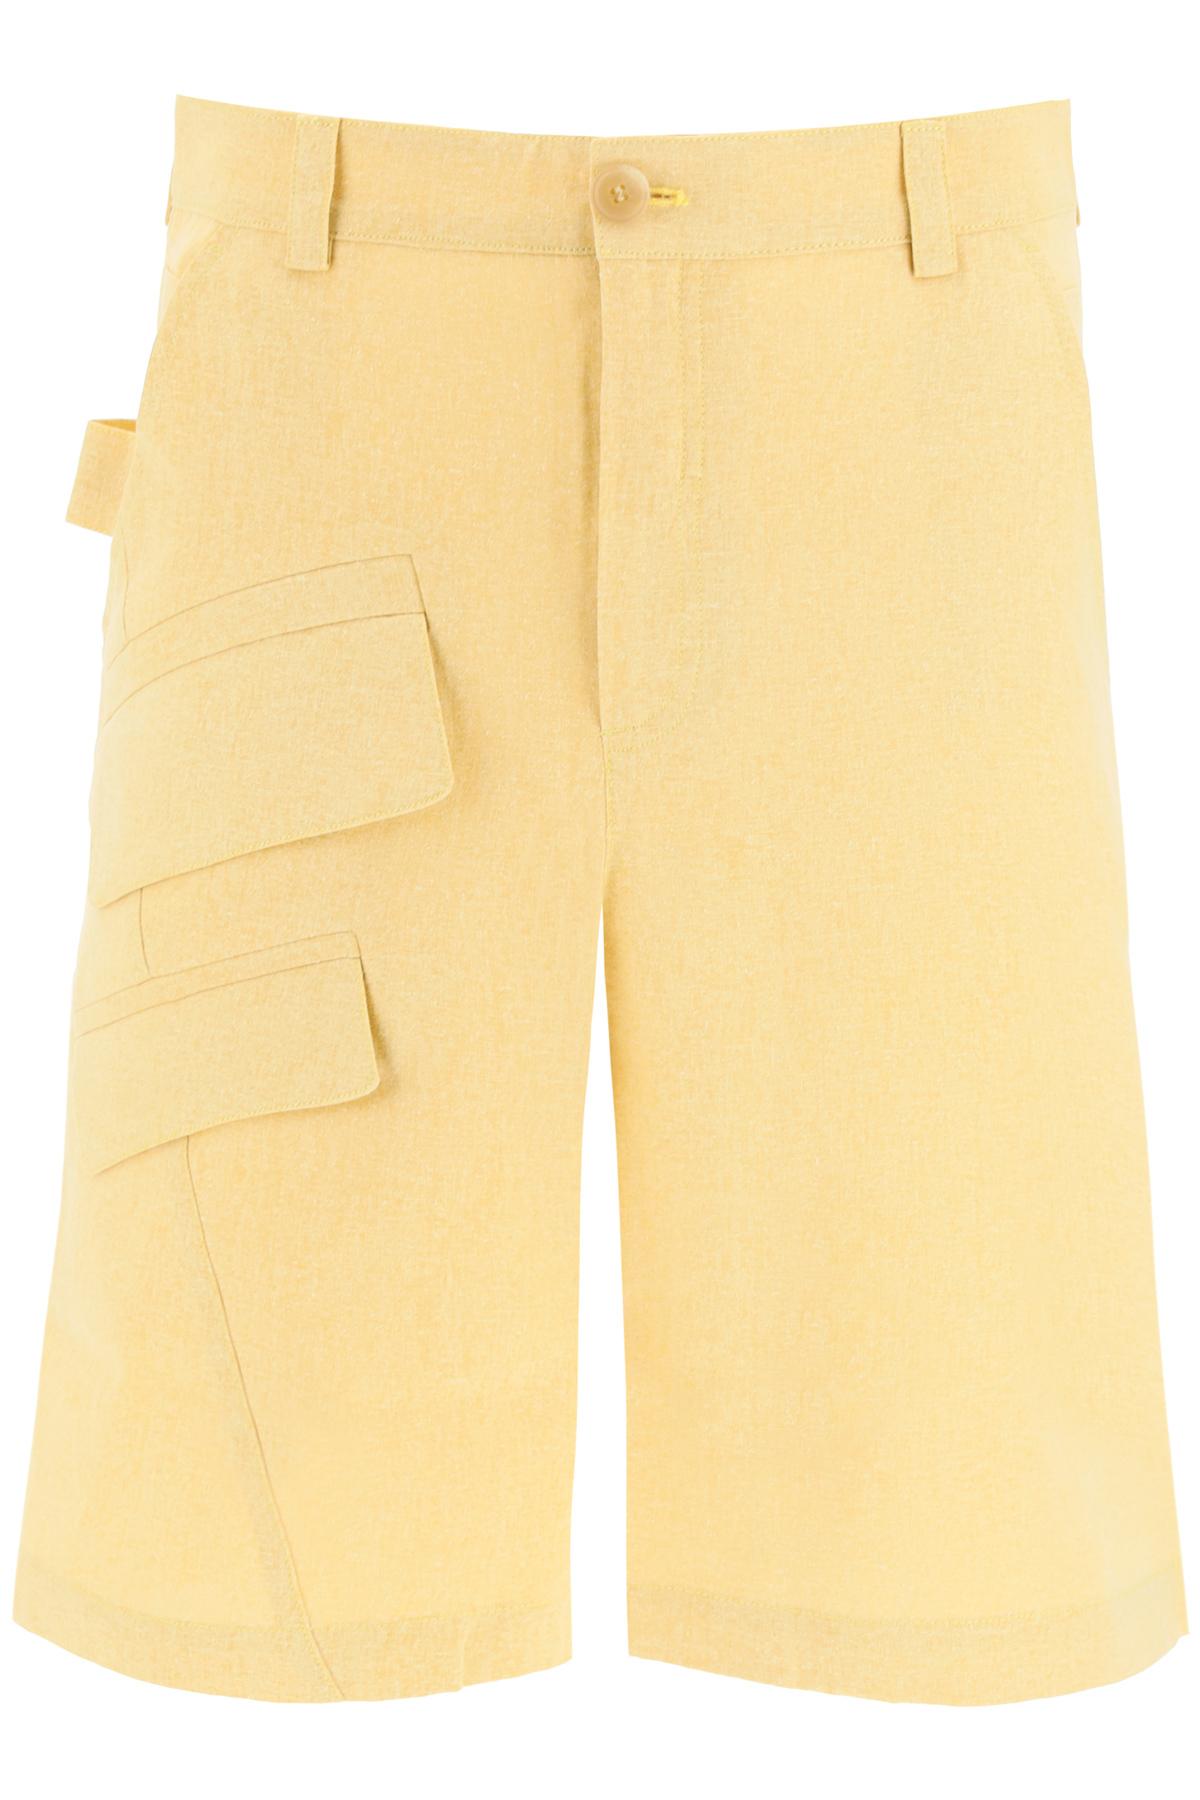 Jacquemus pantalone bermuda colza